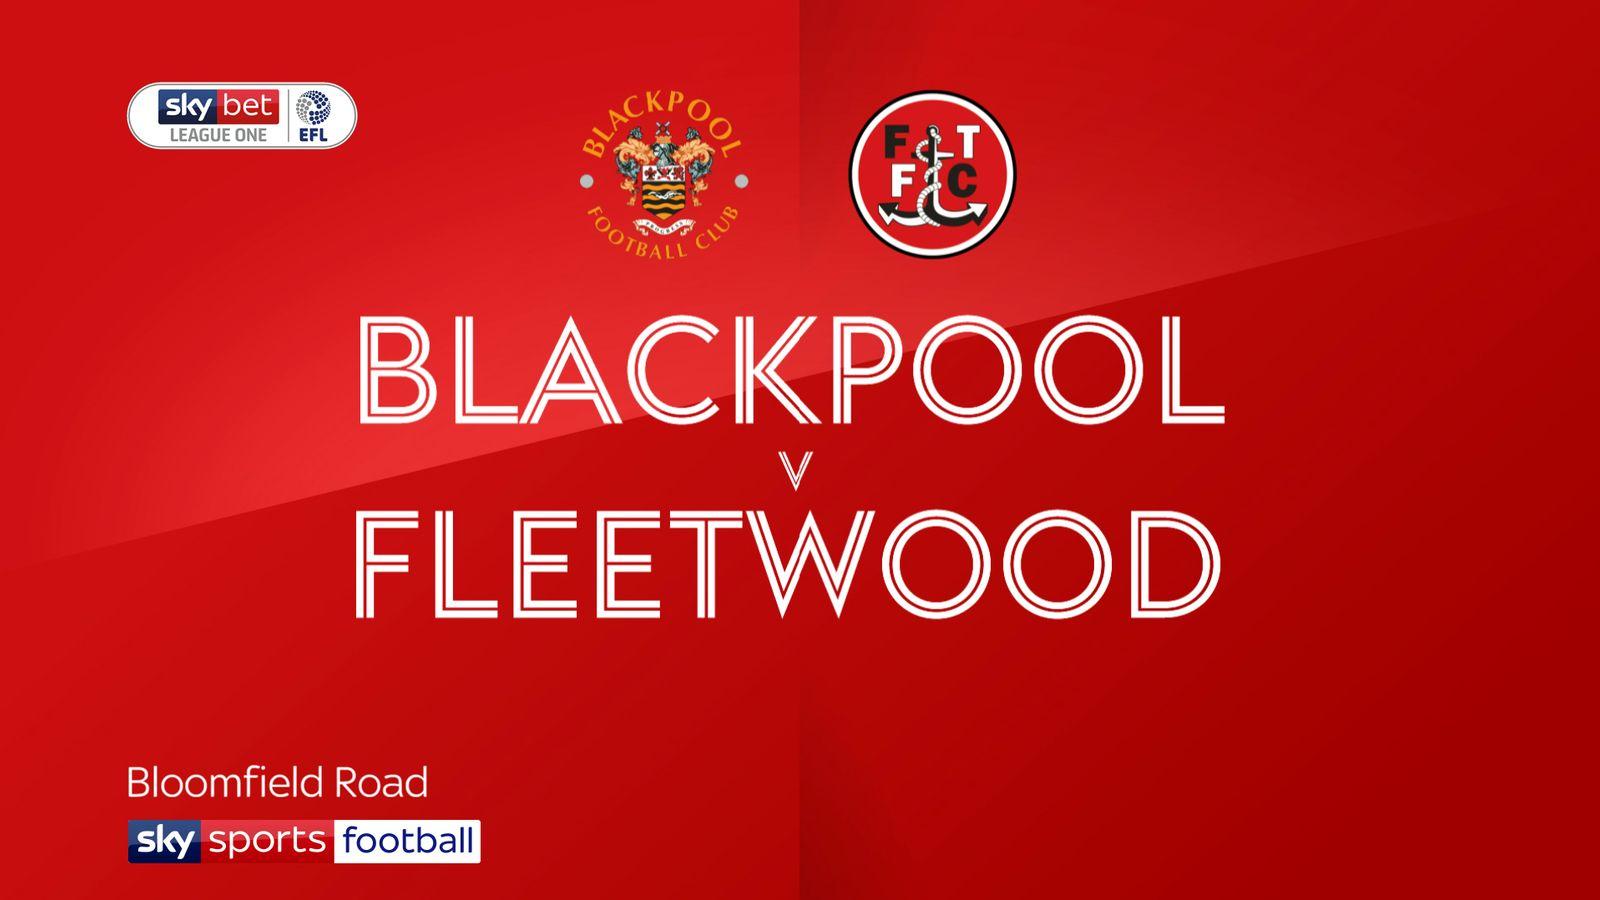 Blackpool 3-1 Fleetwood: Tangerines win heated derby clash